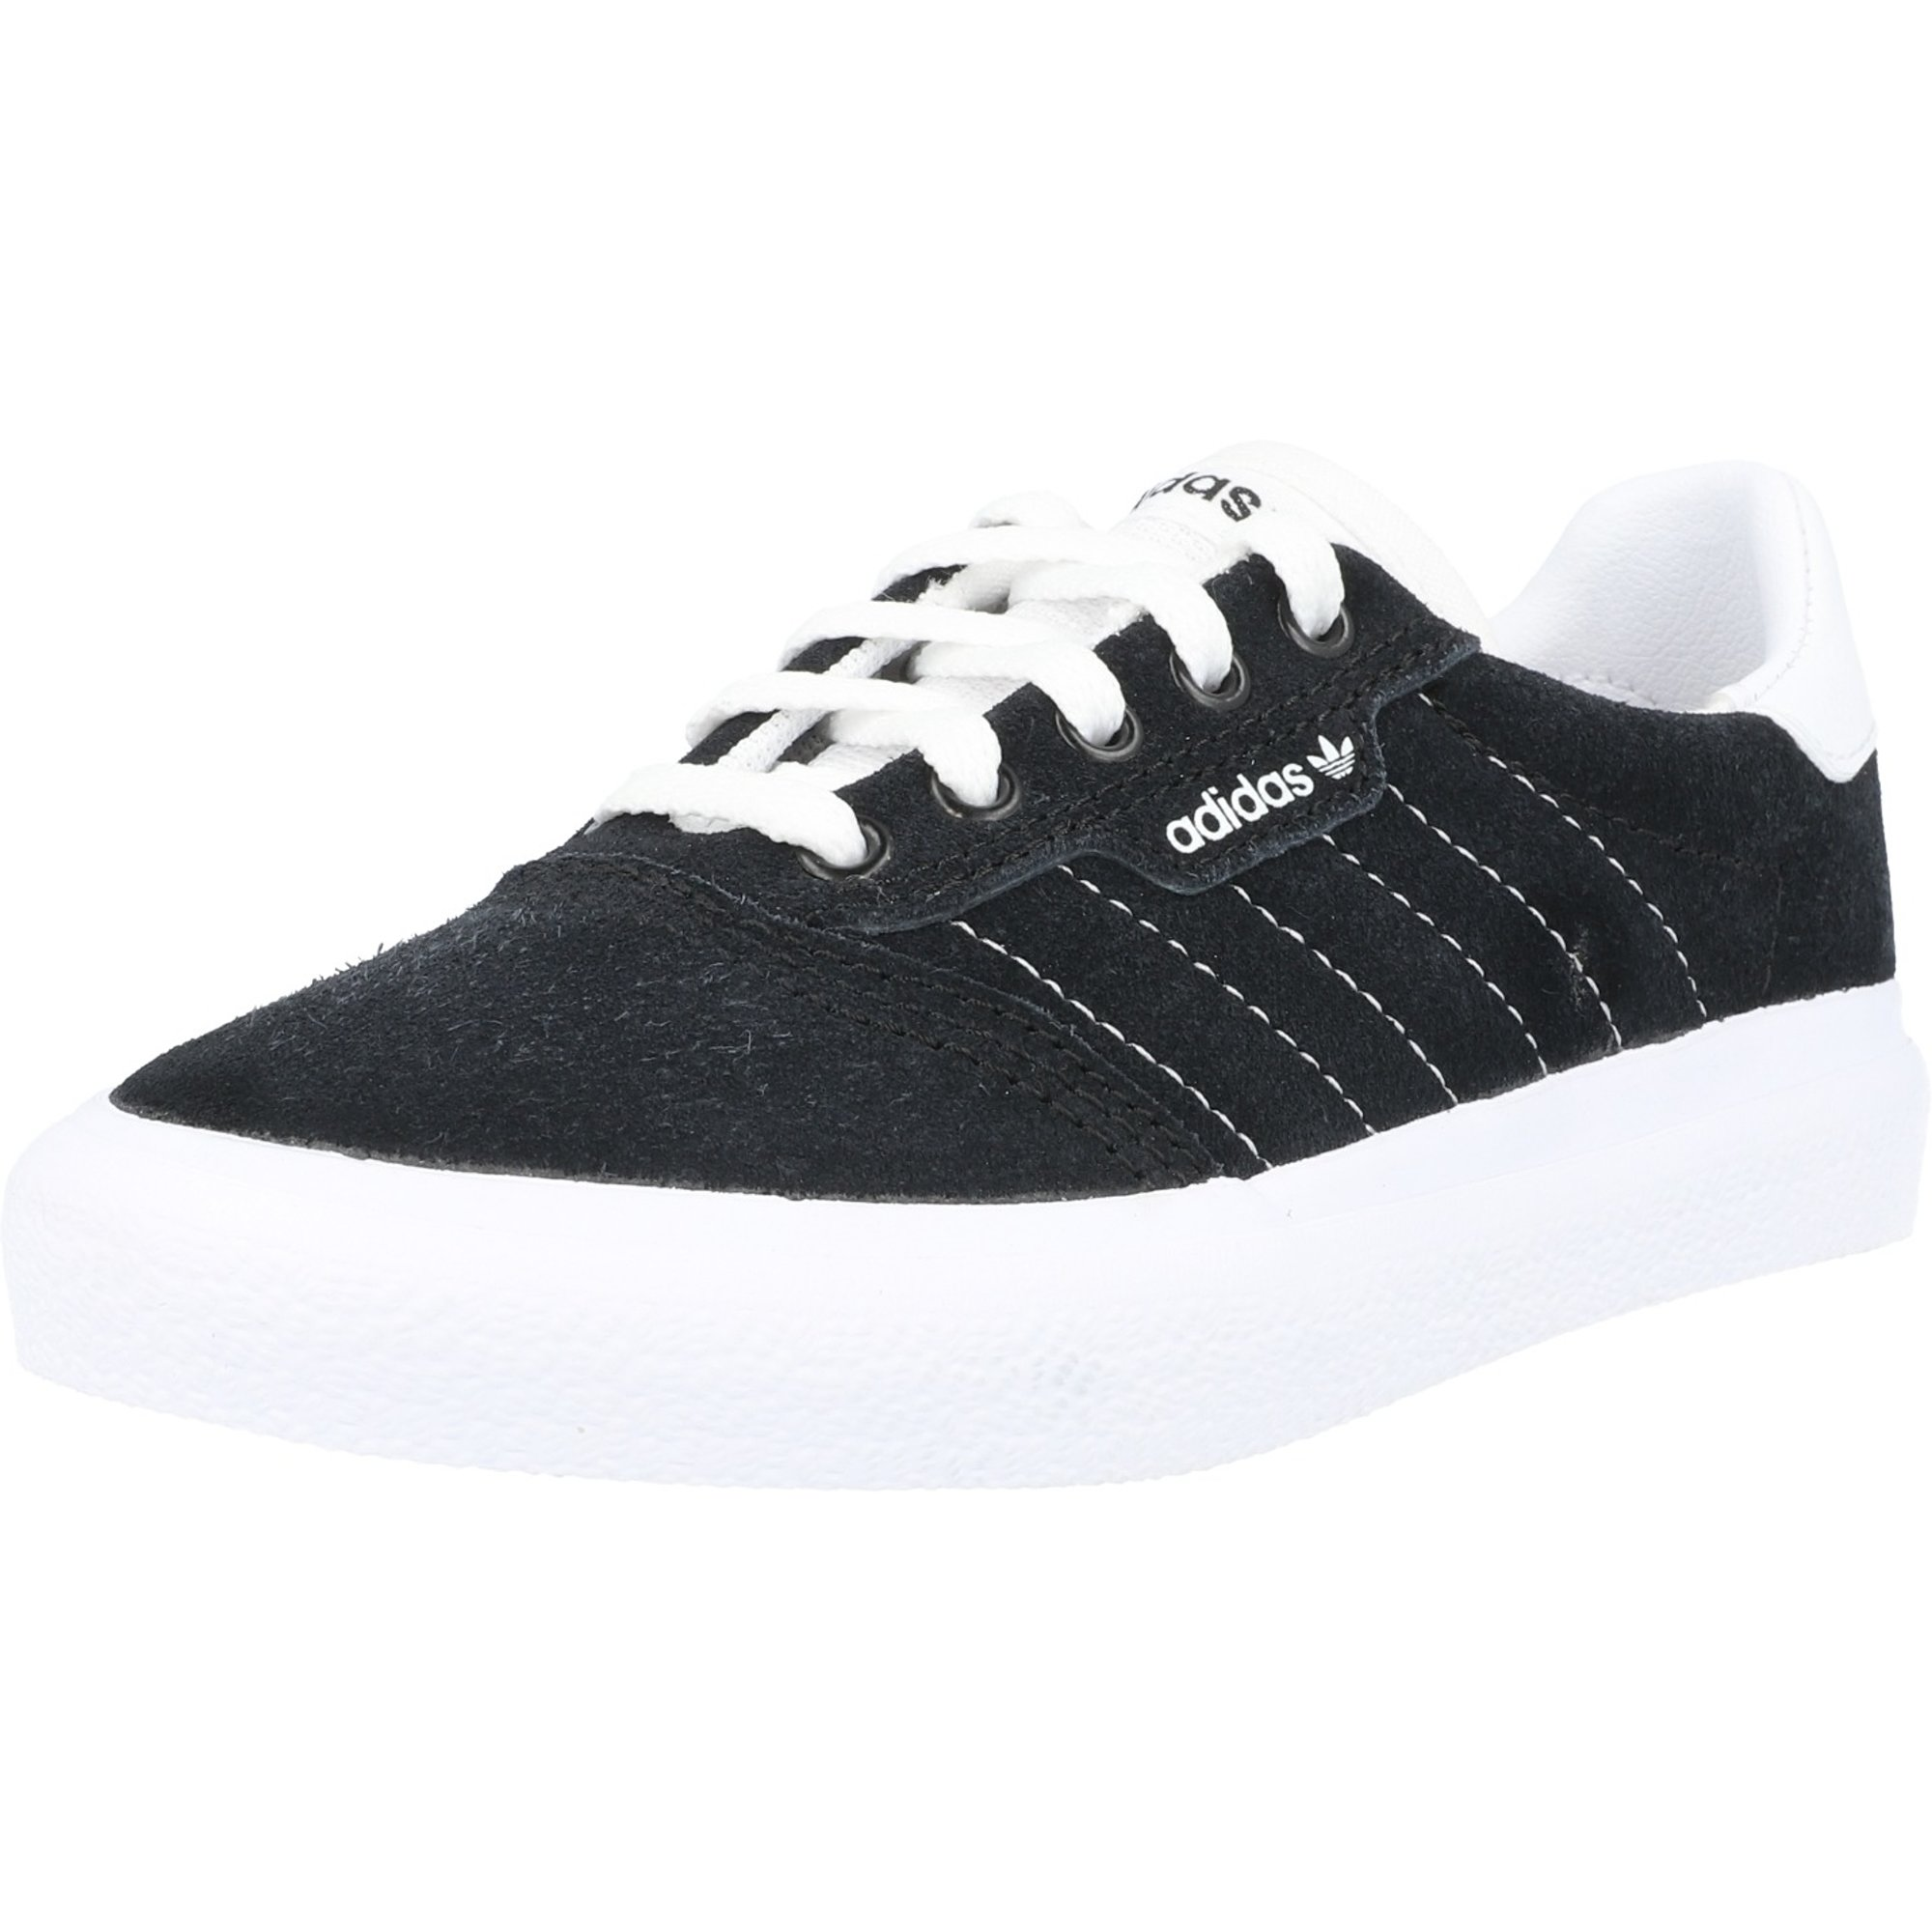 adidas 3MC J Black/White Leather